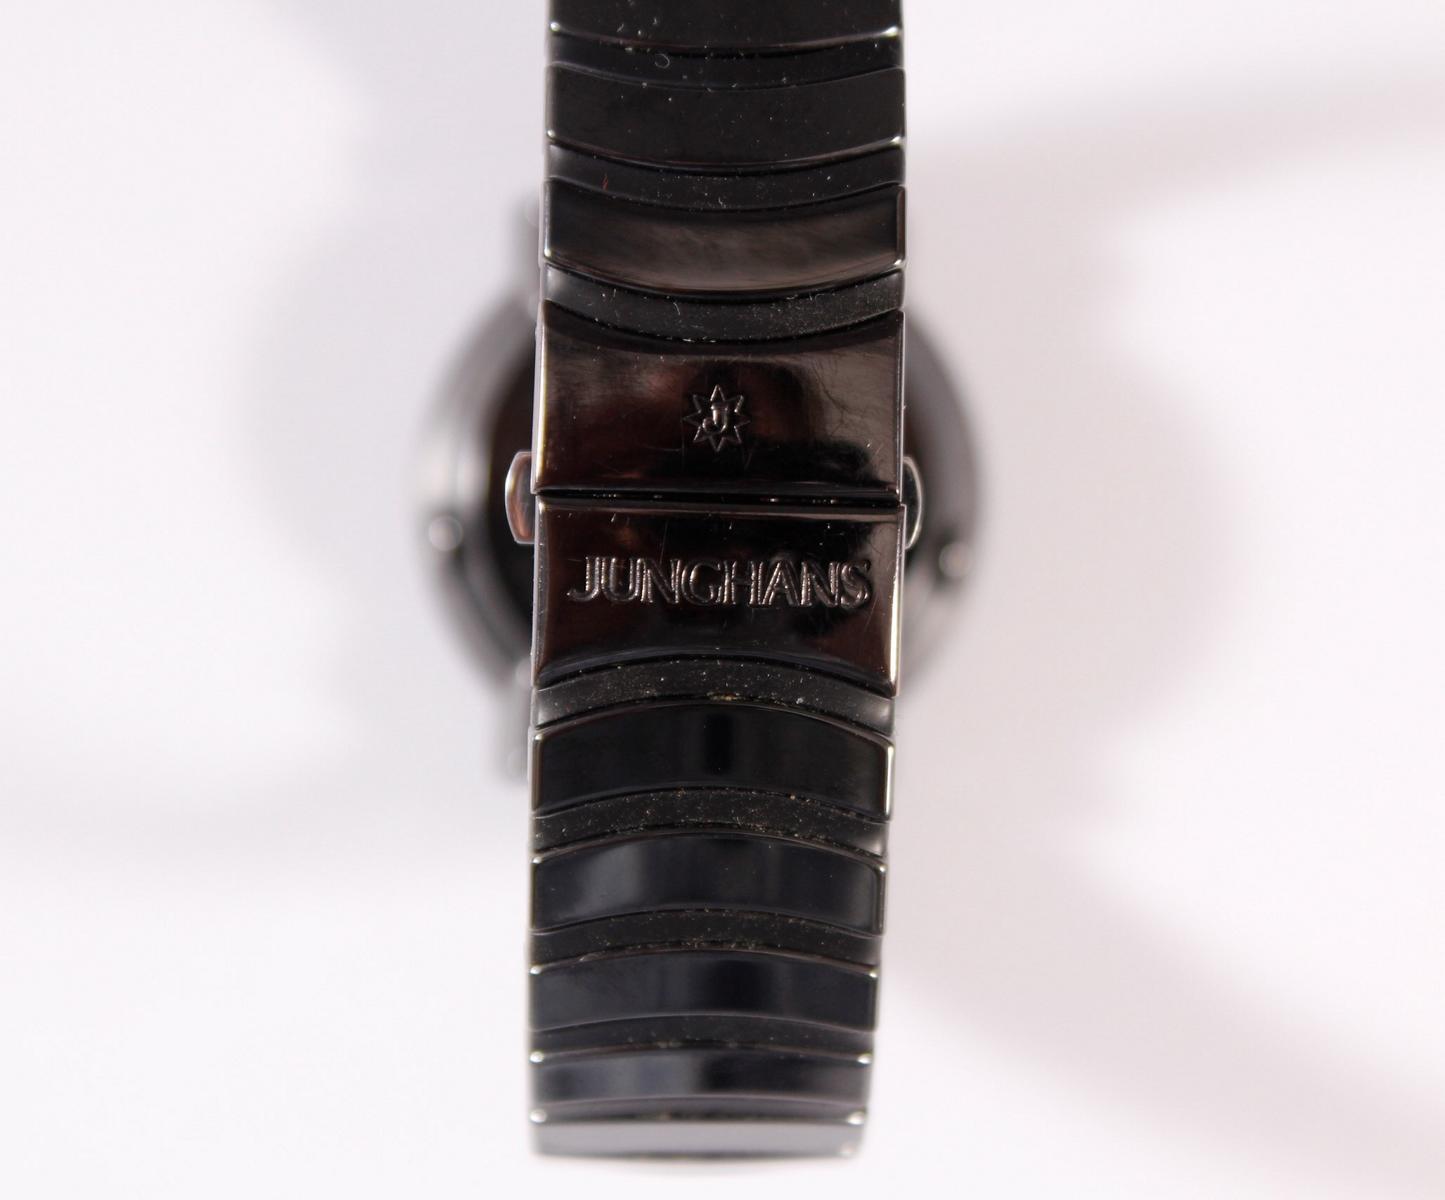 Junghans, Mega Solar Ceramic Herrenarmbanduhr 018 1110-2